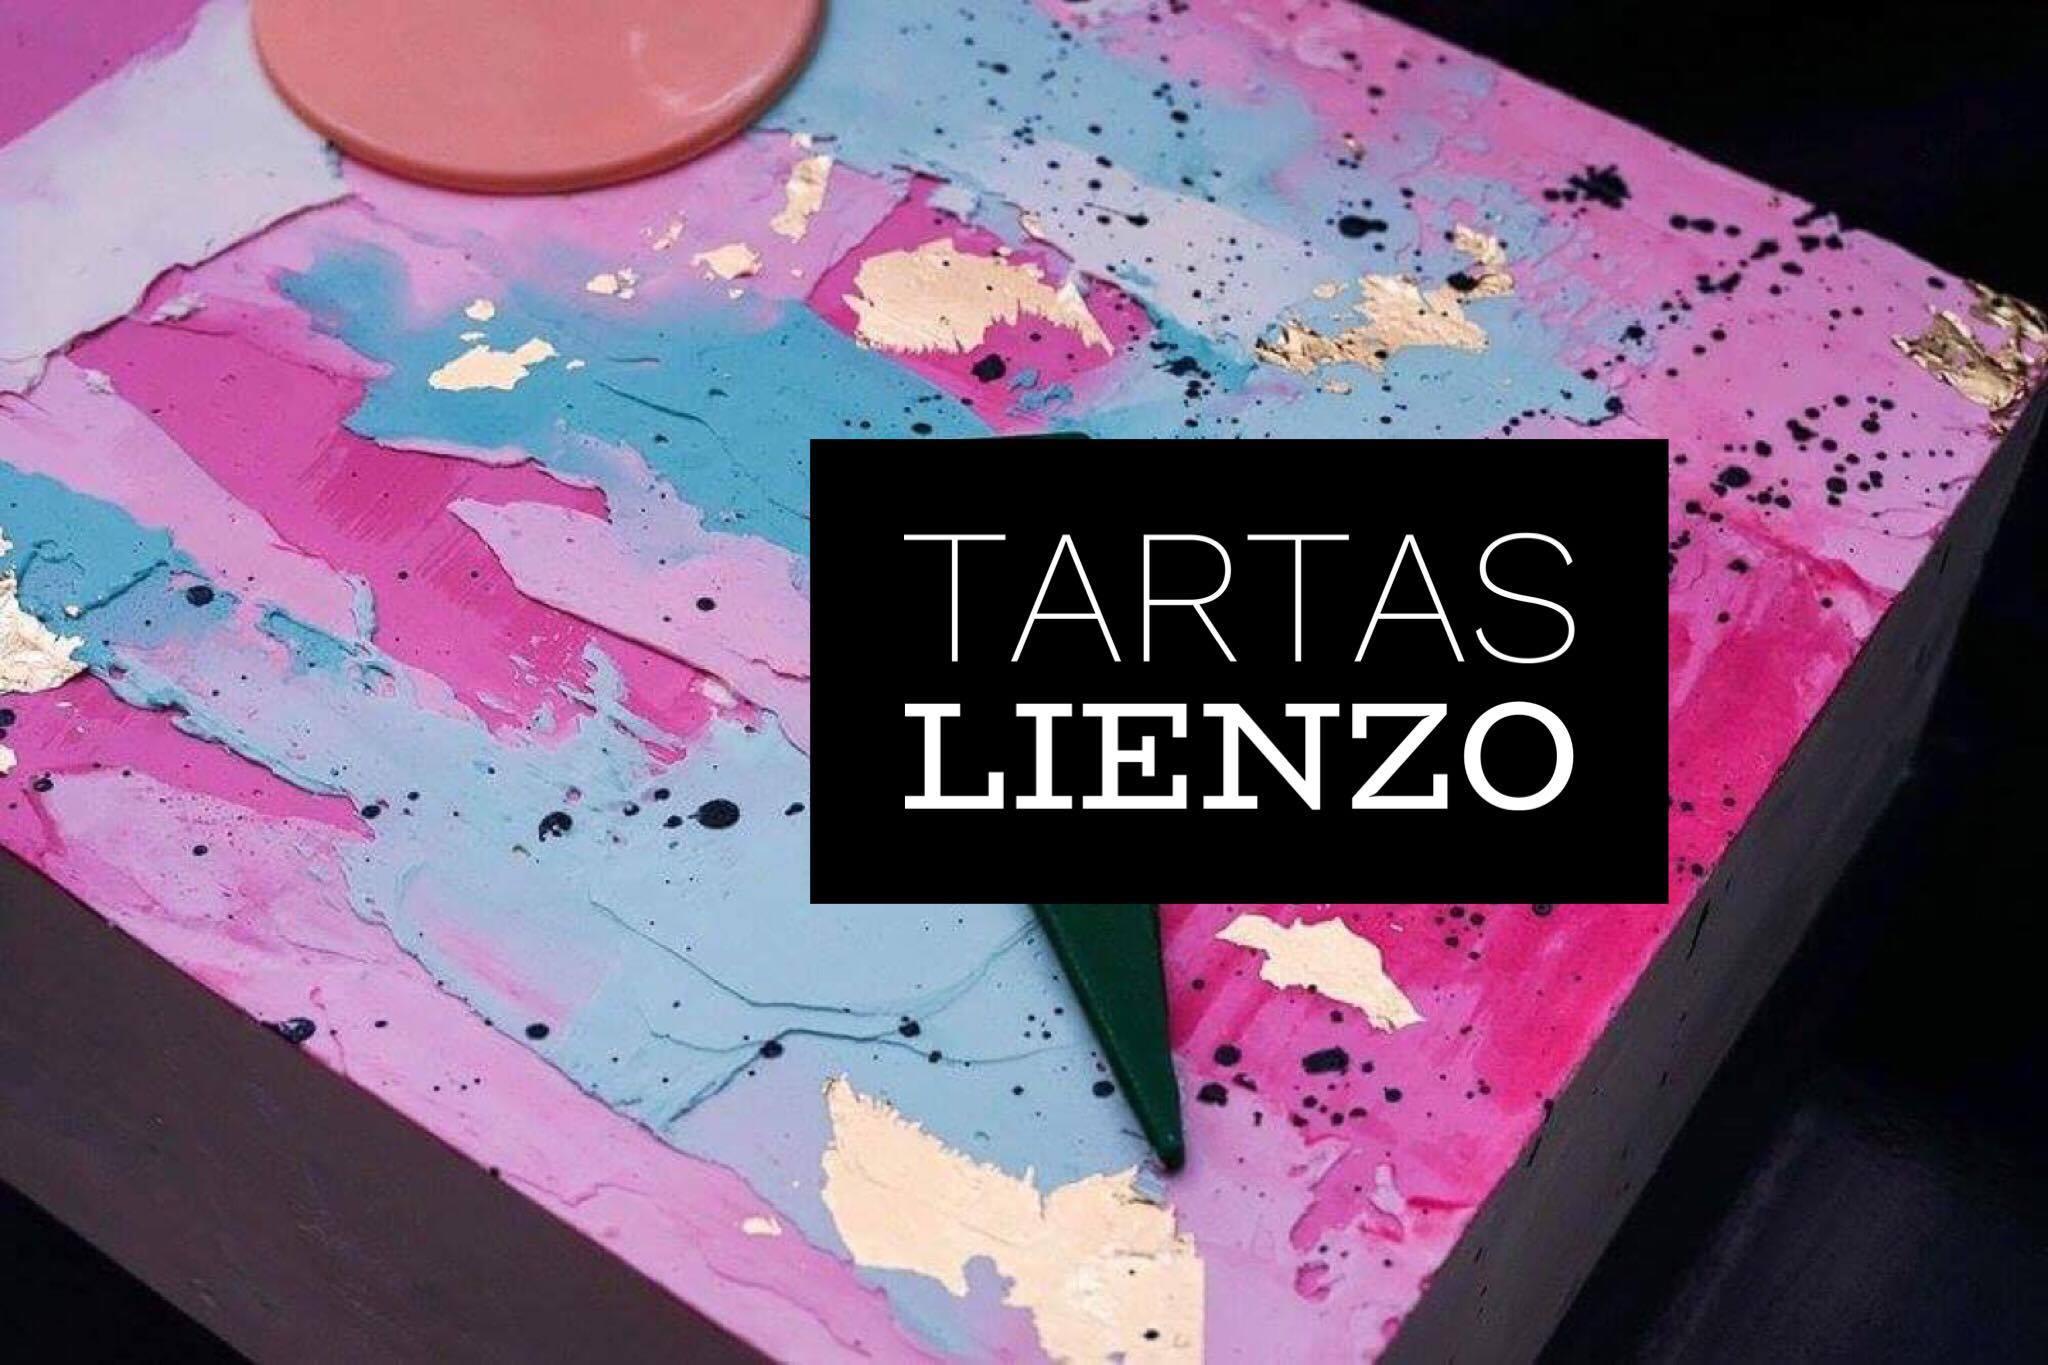 CANVAS CAKES DE DON'T TELL CHARLES: MI APUESTA DE TENDENCIA